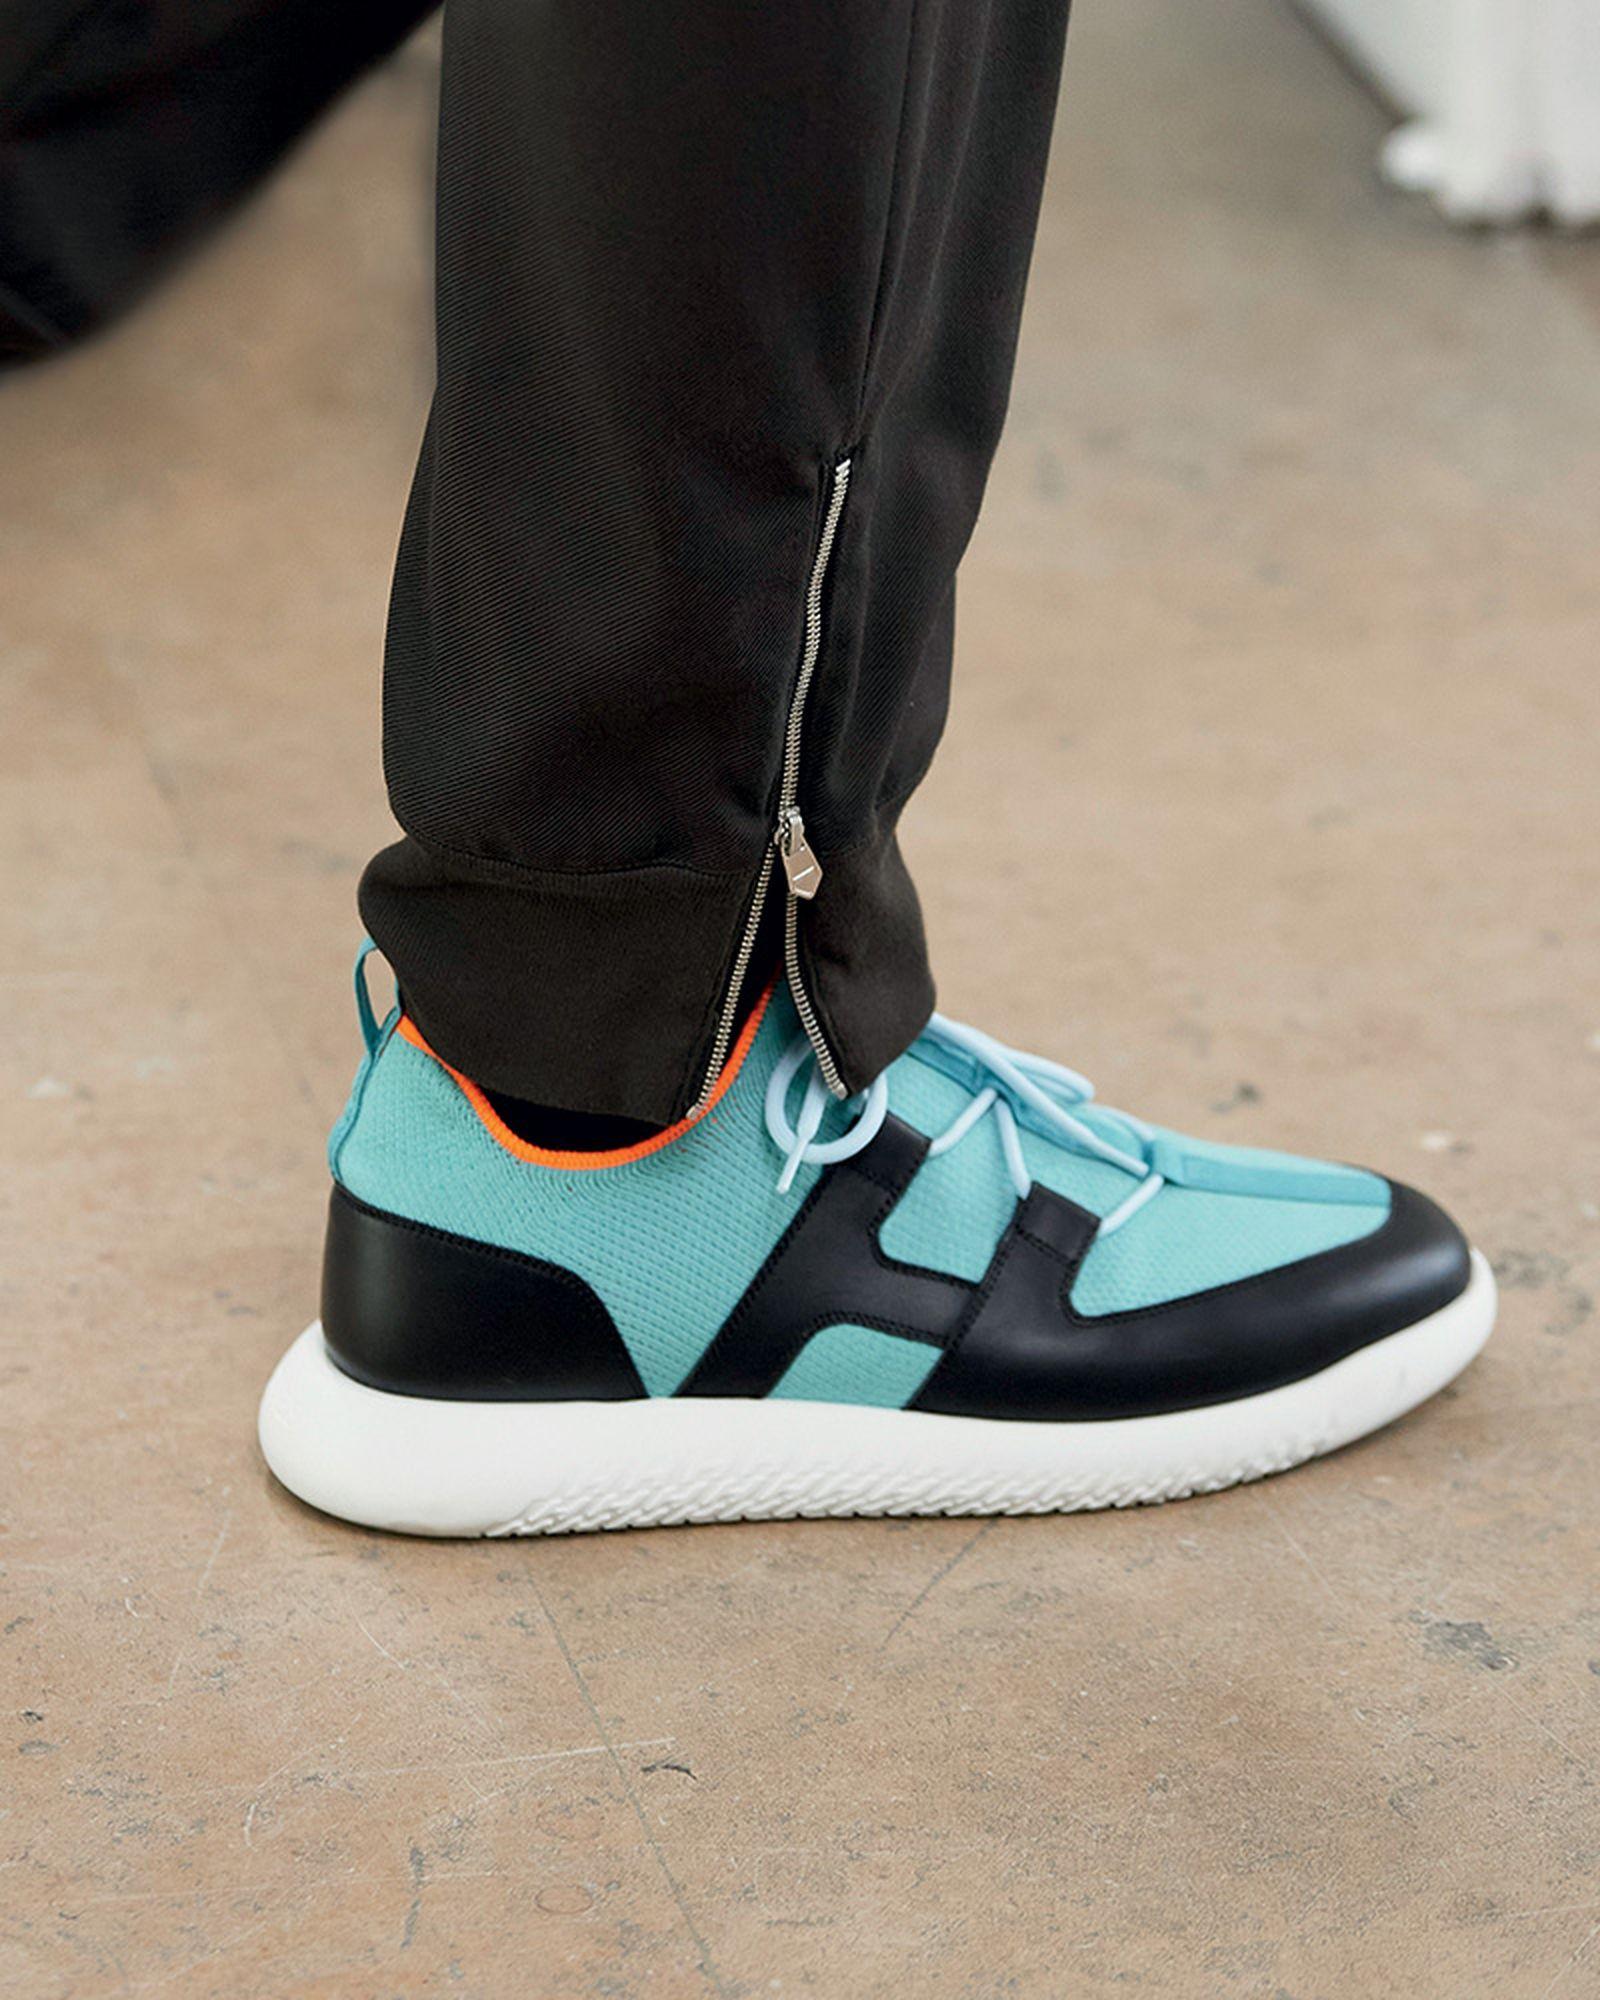 fashion-week-fw21-sneaker-roundup-hermes-02